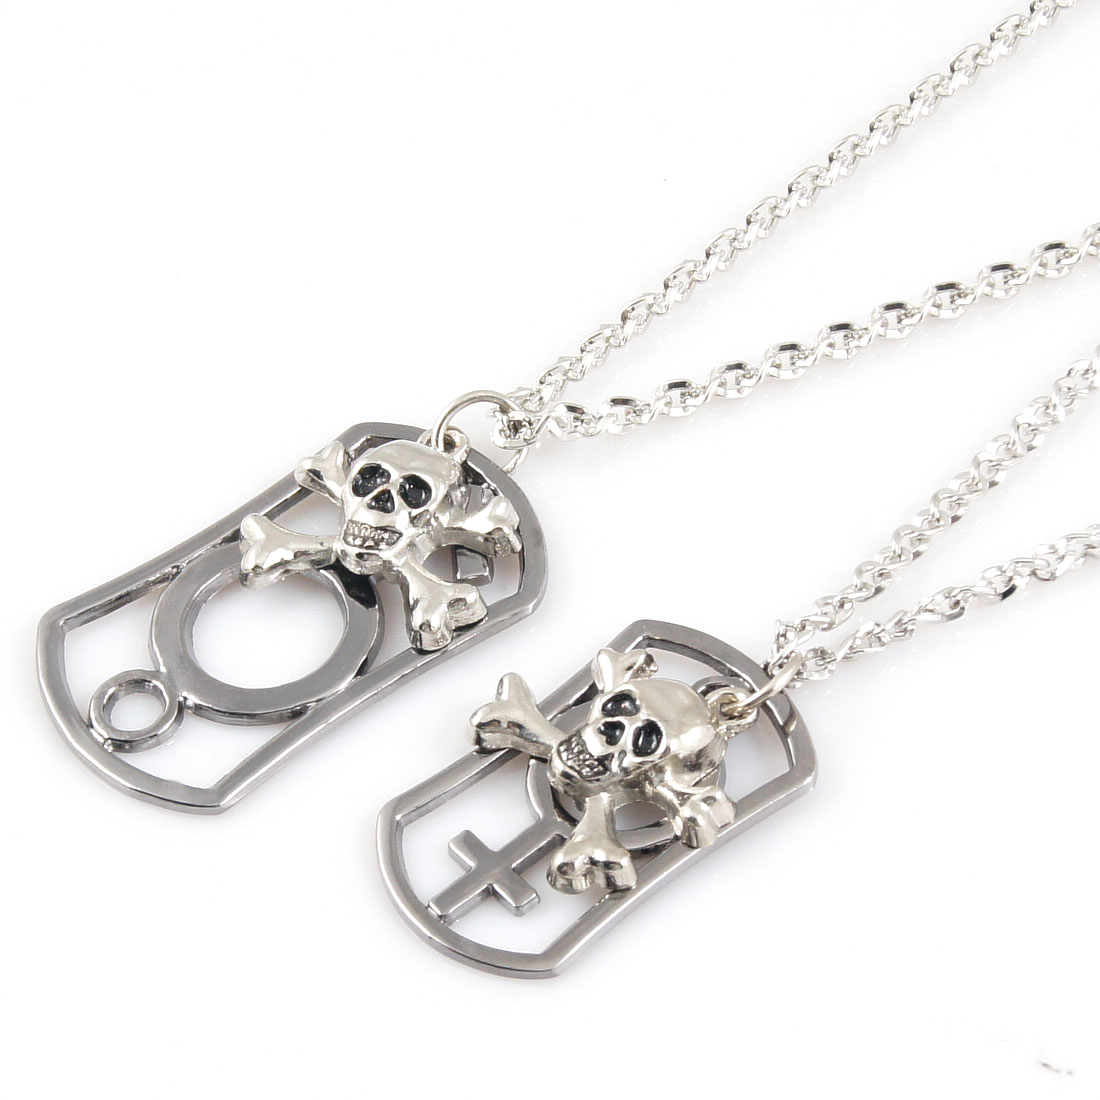 Pair Men Women Silver Tone Male Female Symbol Pendant Chain Chocker Necklace